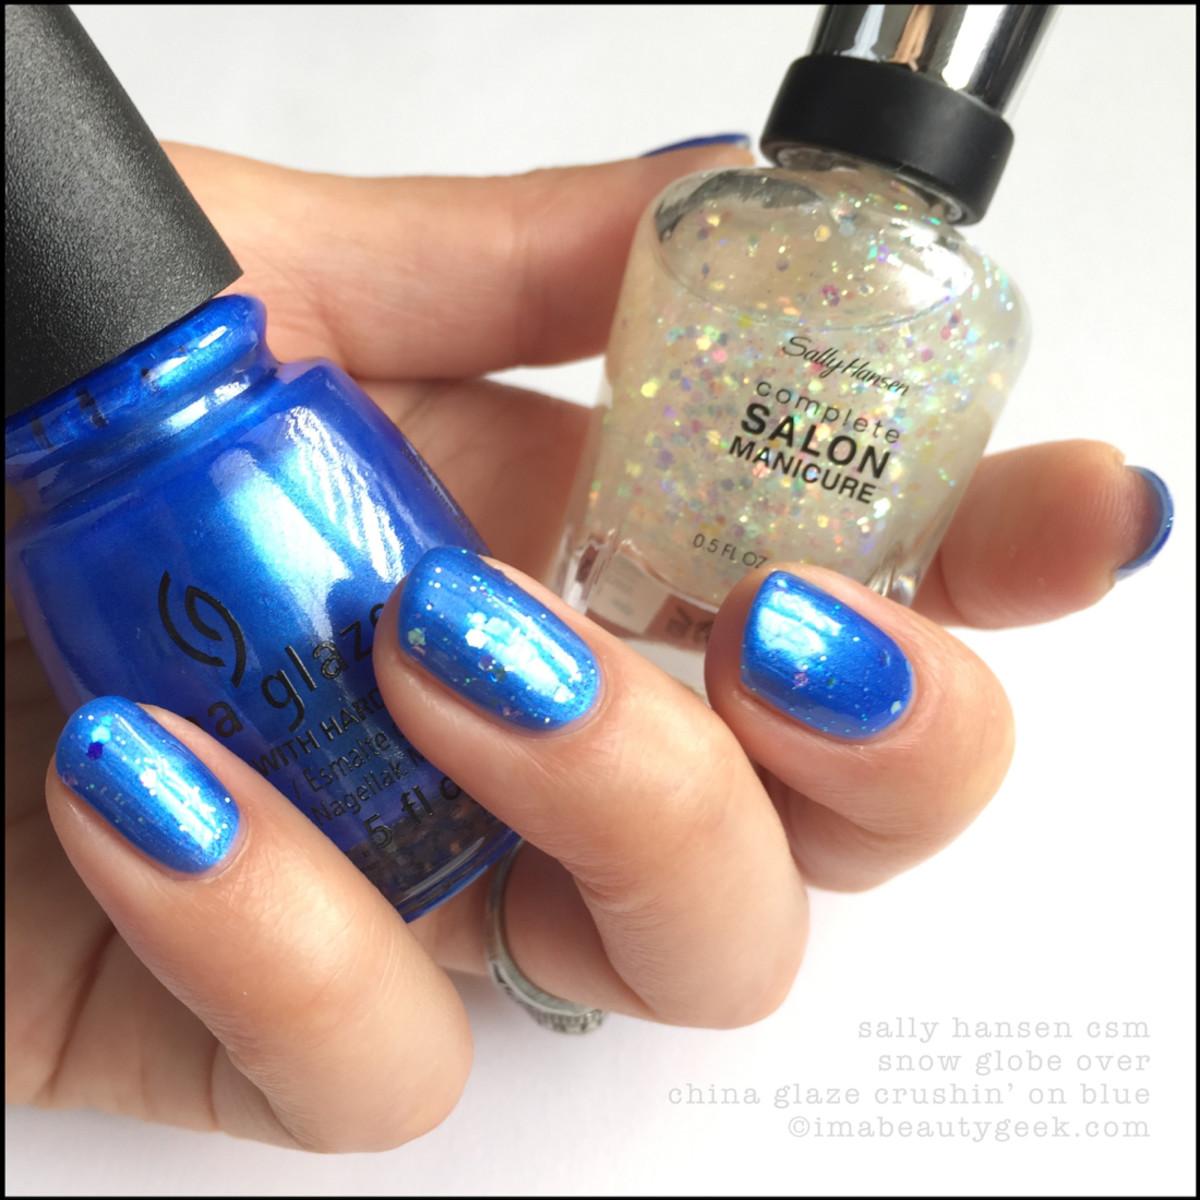 Sally Hansen Snow Globe over China Glaze Crushin' on Blue